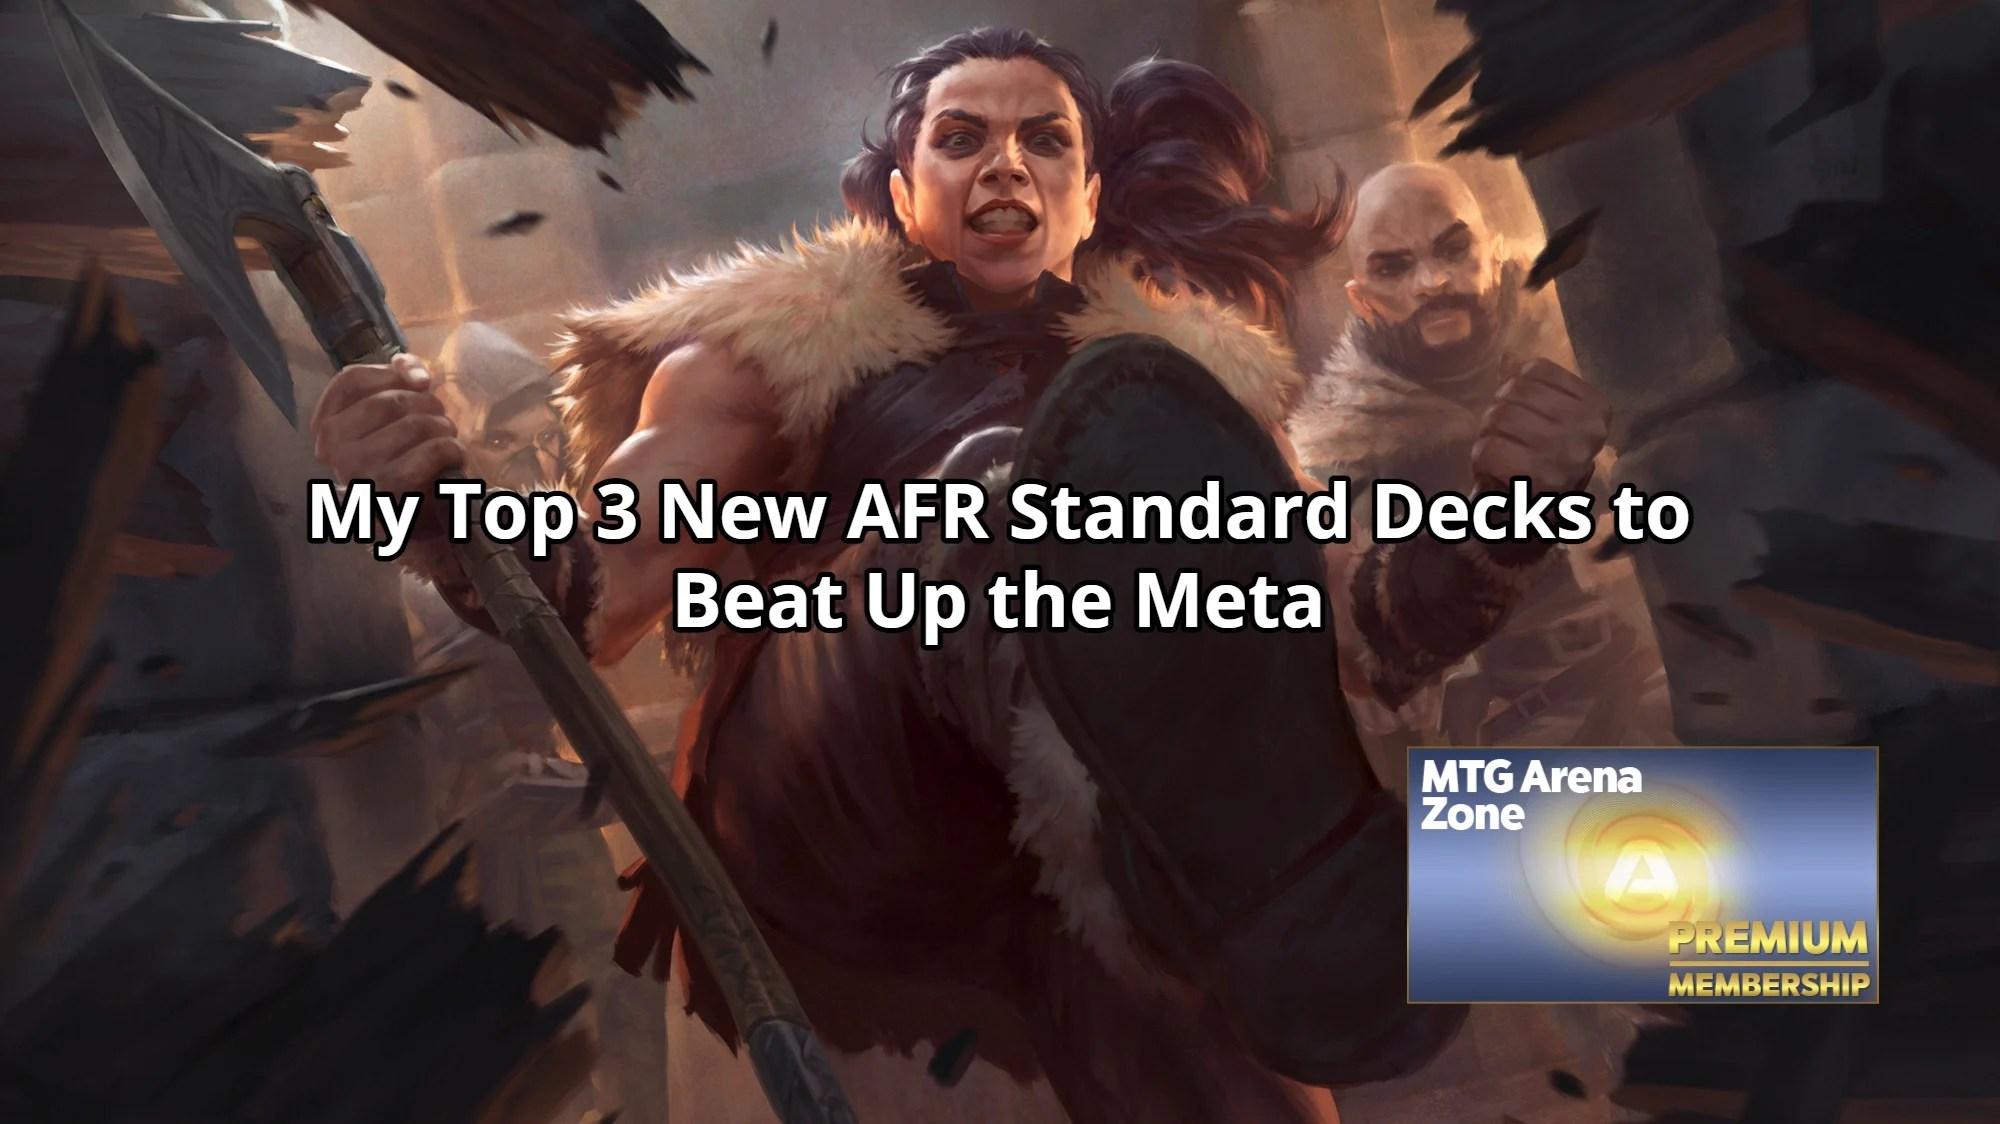 My Top 3 New AFR Standard Decks to Beat Up the Meta